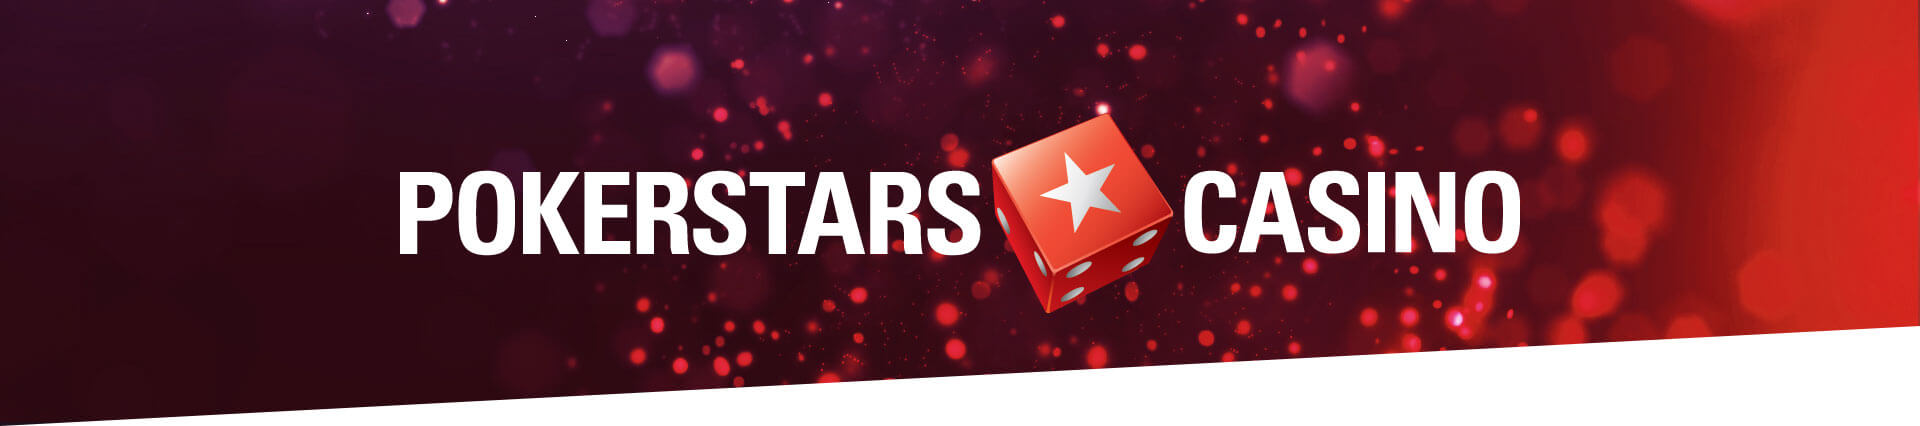 PokerStars Casino CS Formule 1